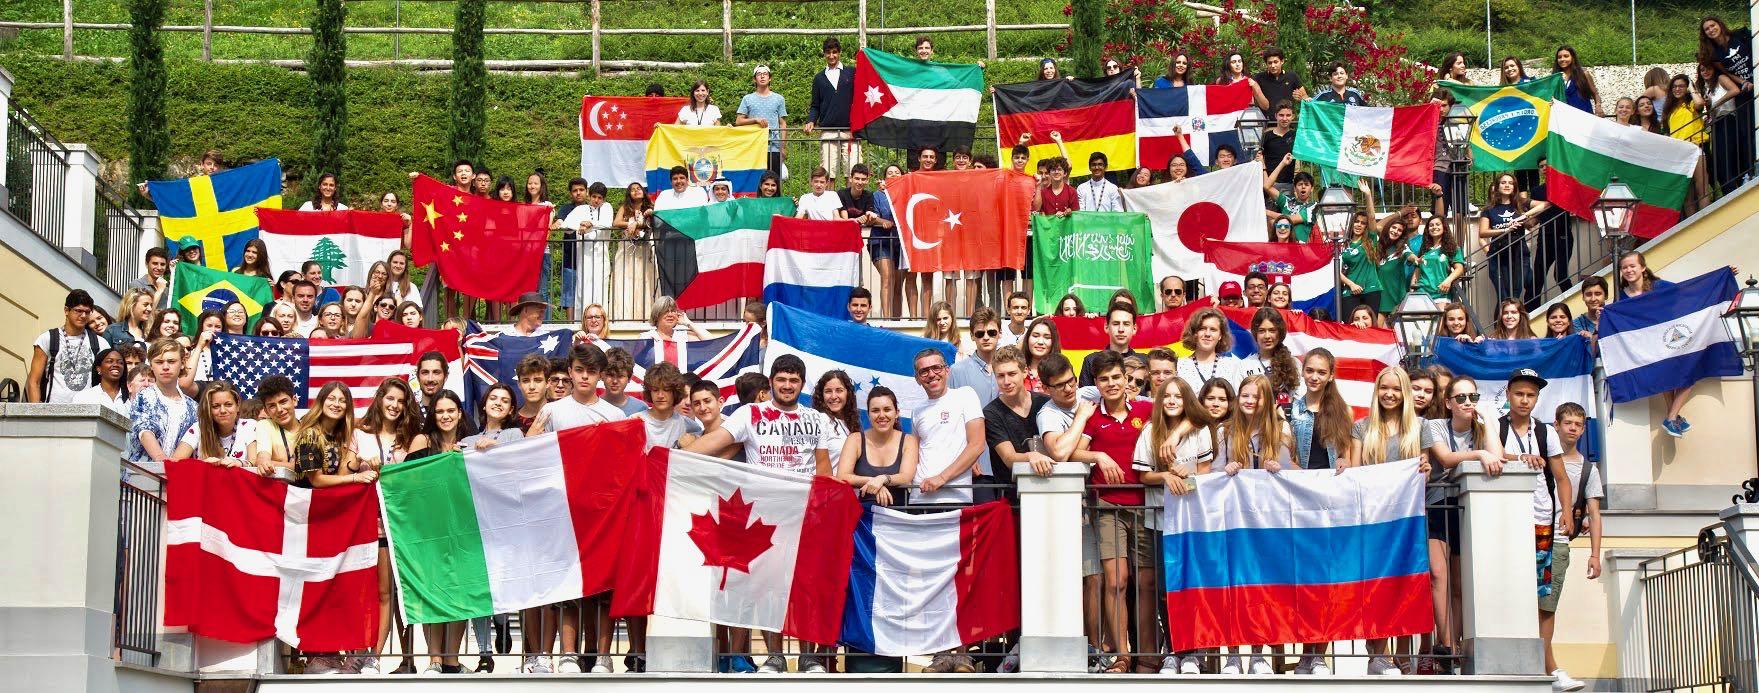 ©TASIS - The American School in Switzerland